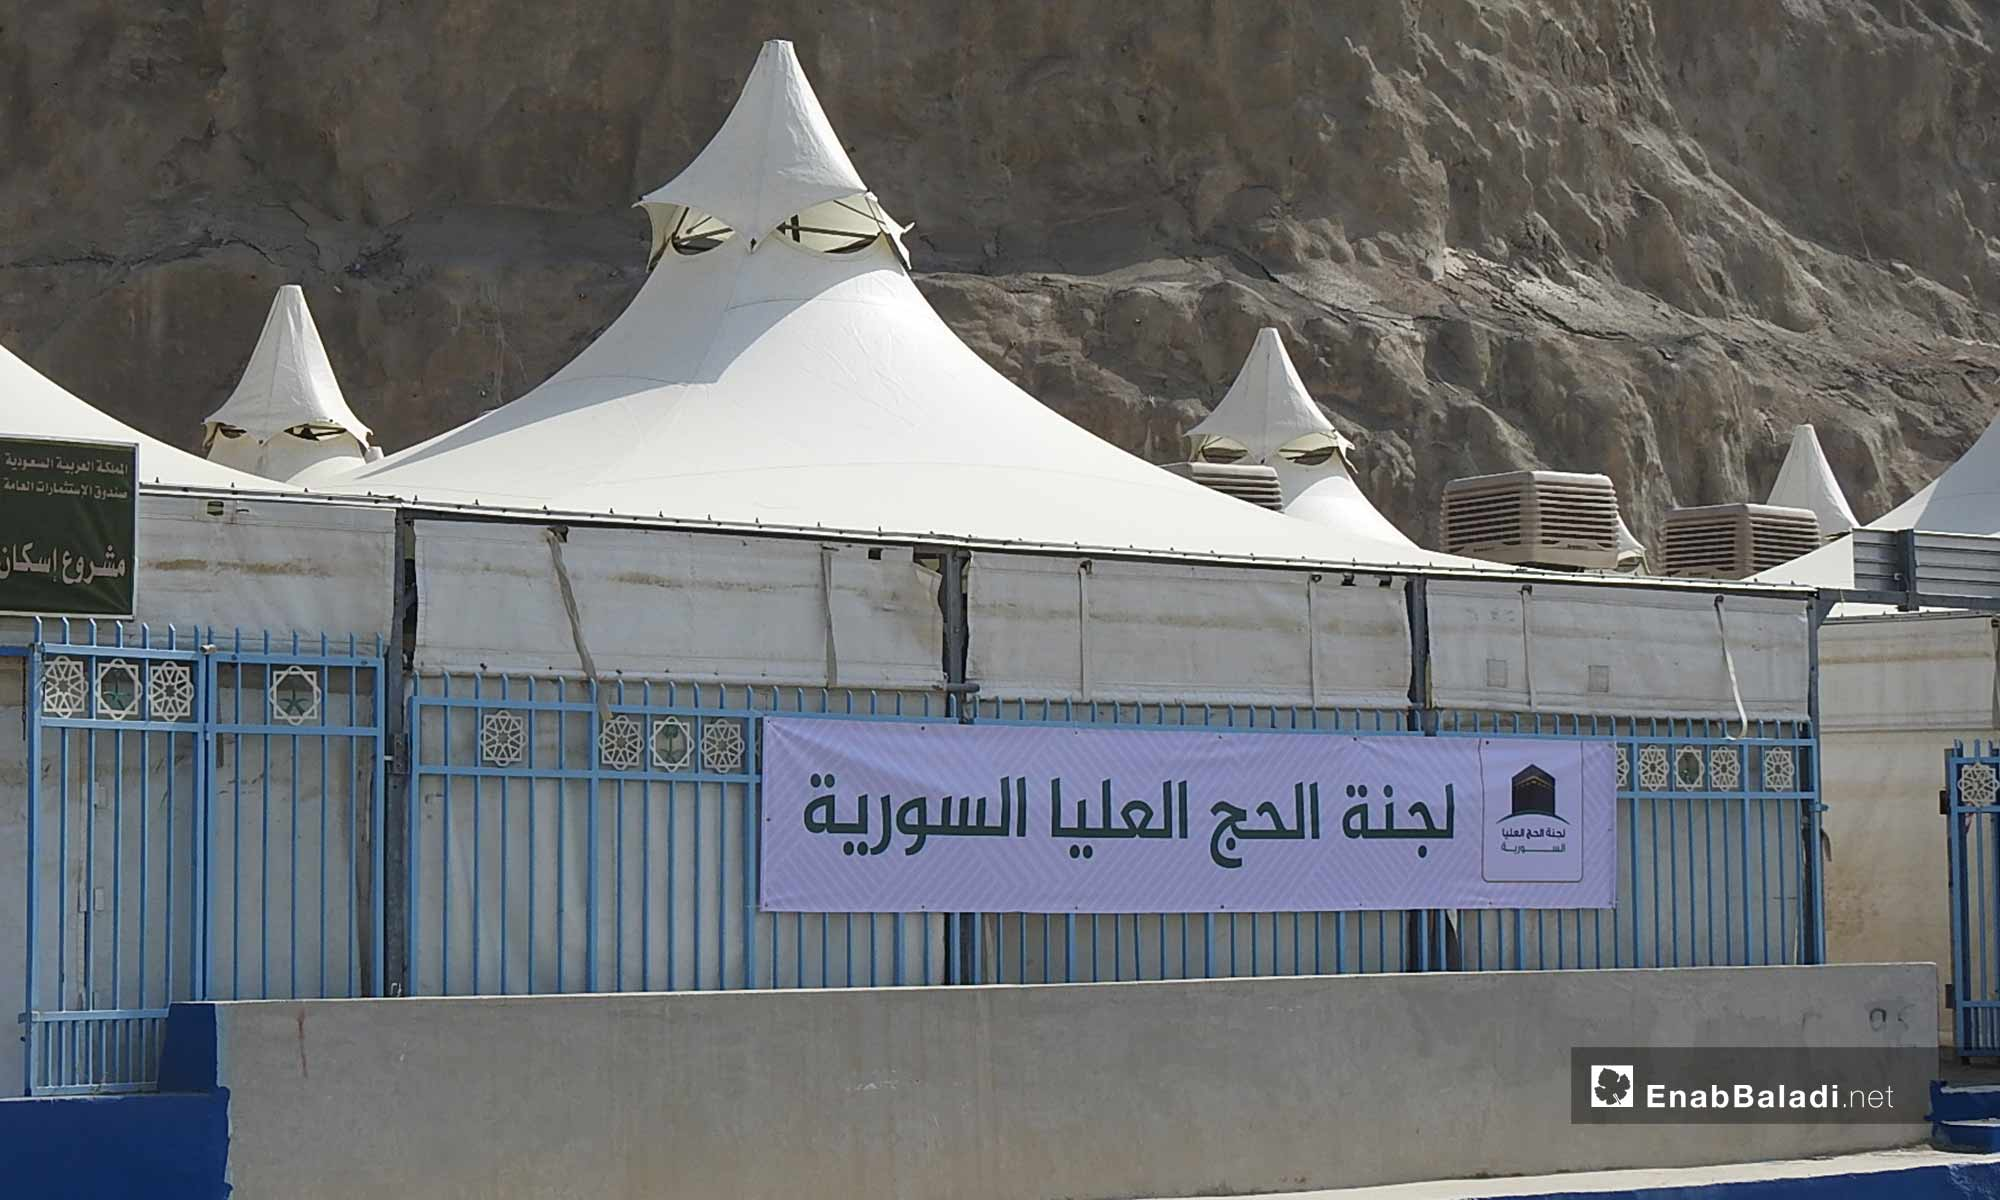 Pilgrims tents in Mecca - 2018 (Enab Baladi)